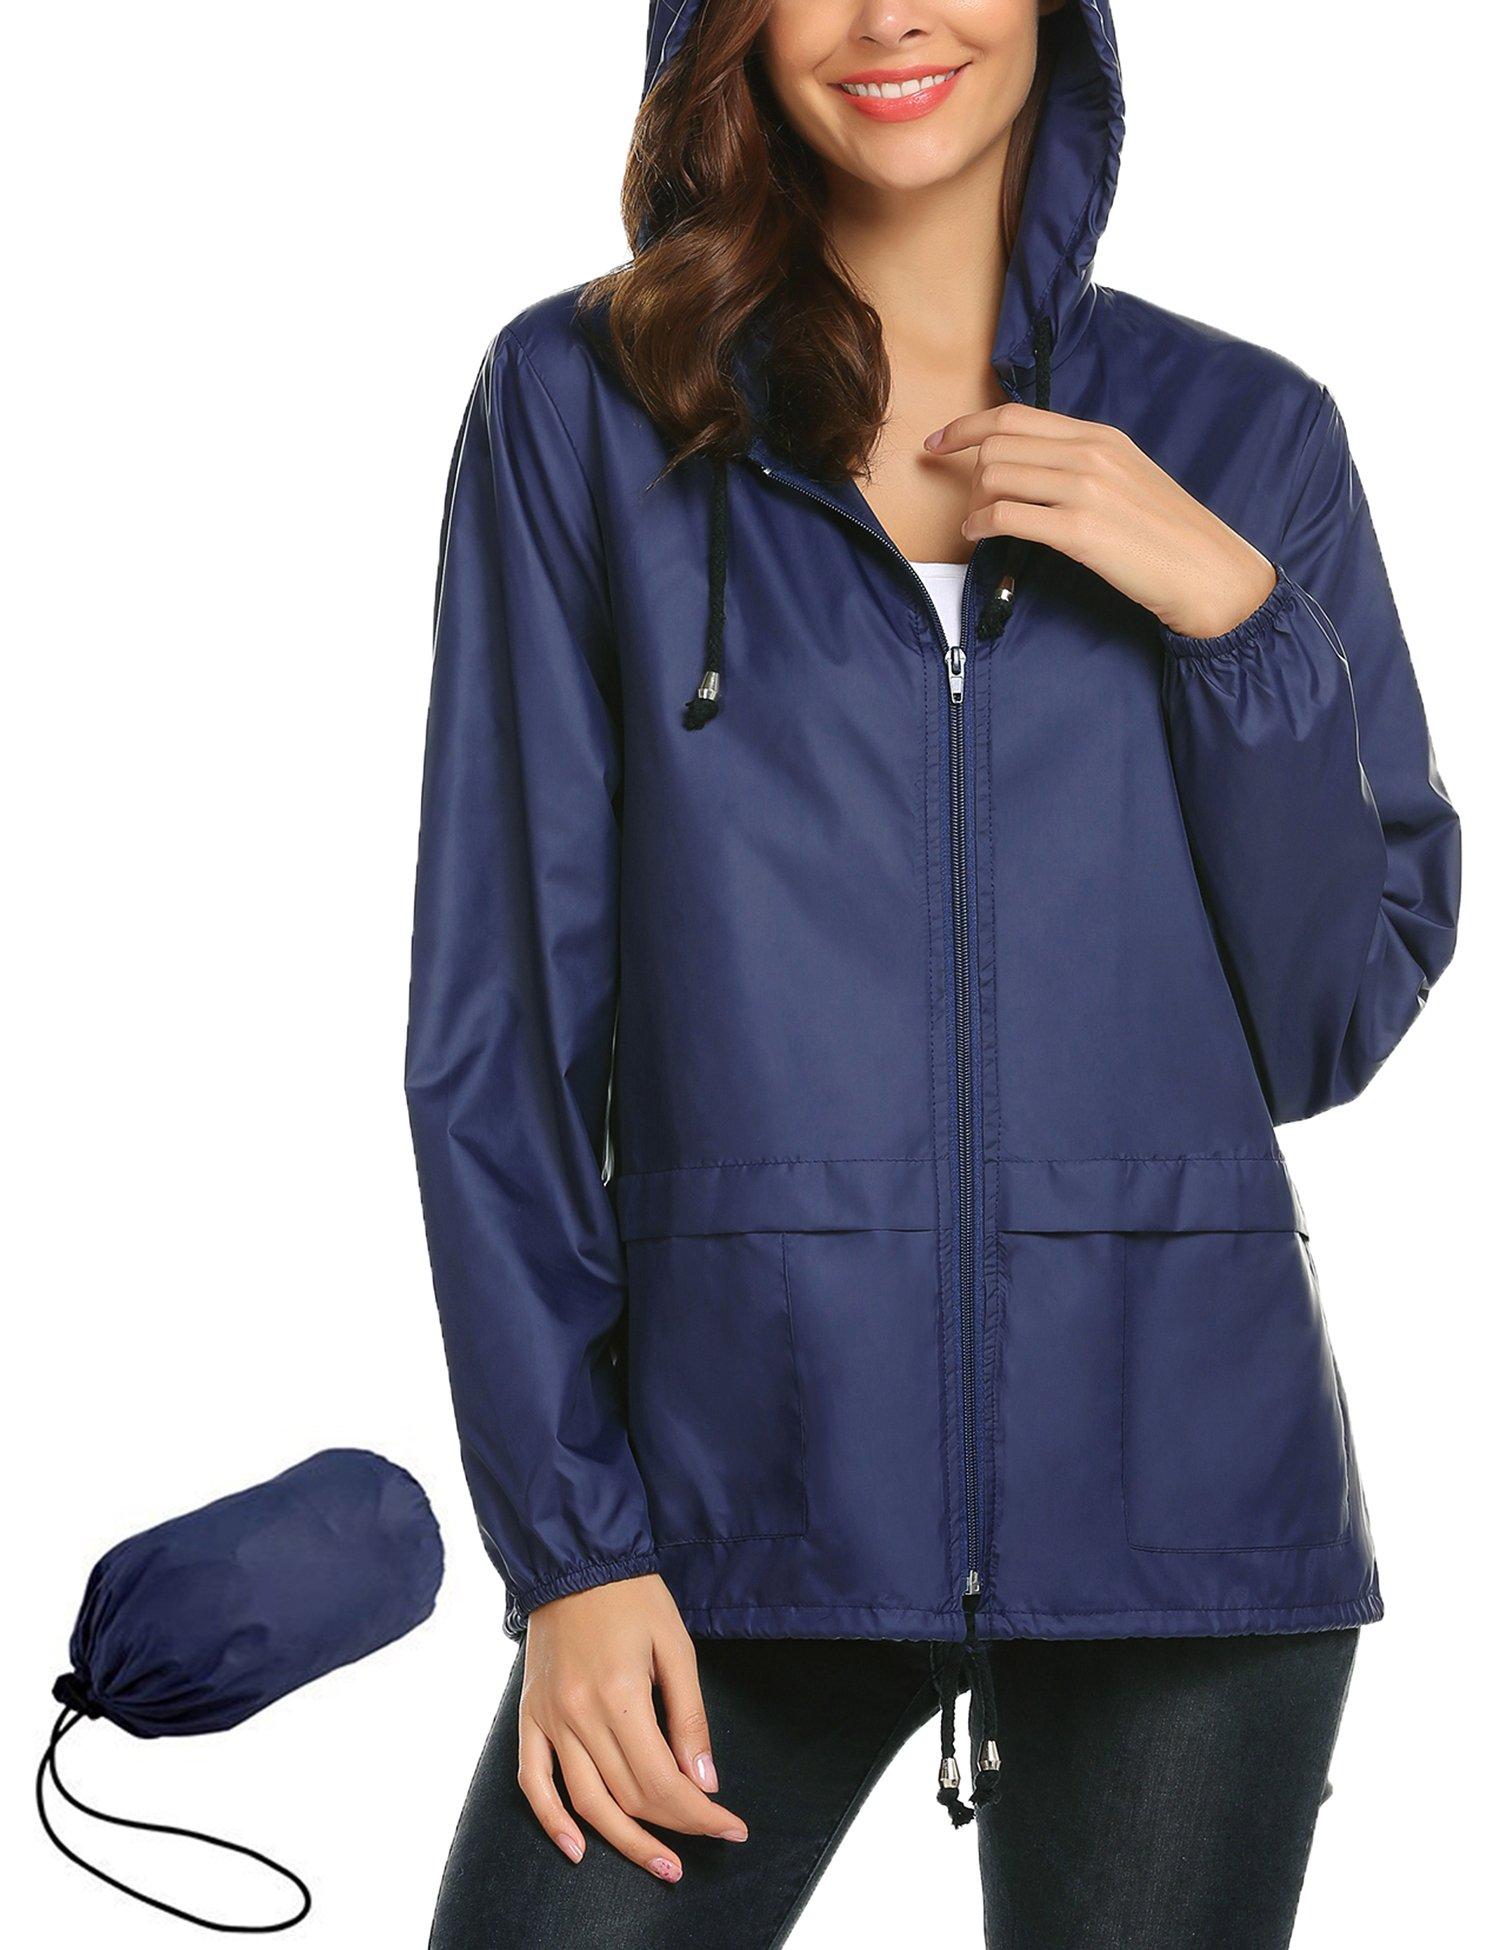 Womens' Waterproof Lightweight Raincoat Hooded Outdoor Hiking Packable Rain Jacket Outdoor Travel Trench Navy Blue S